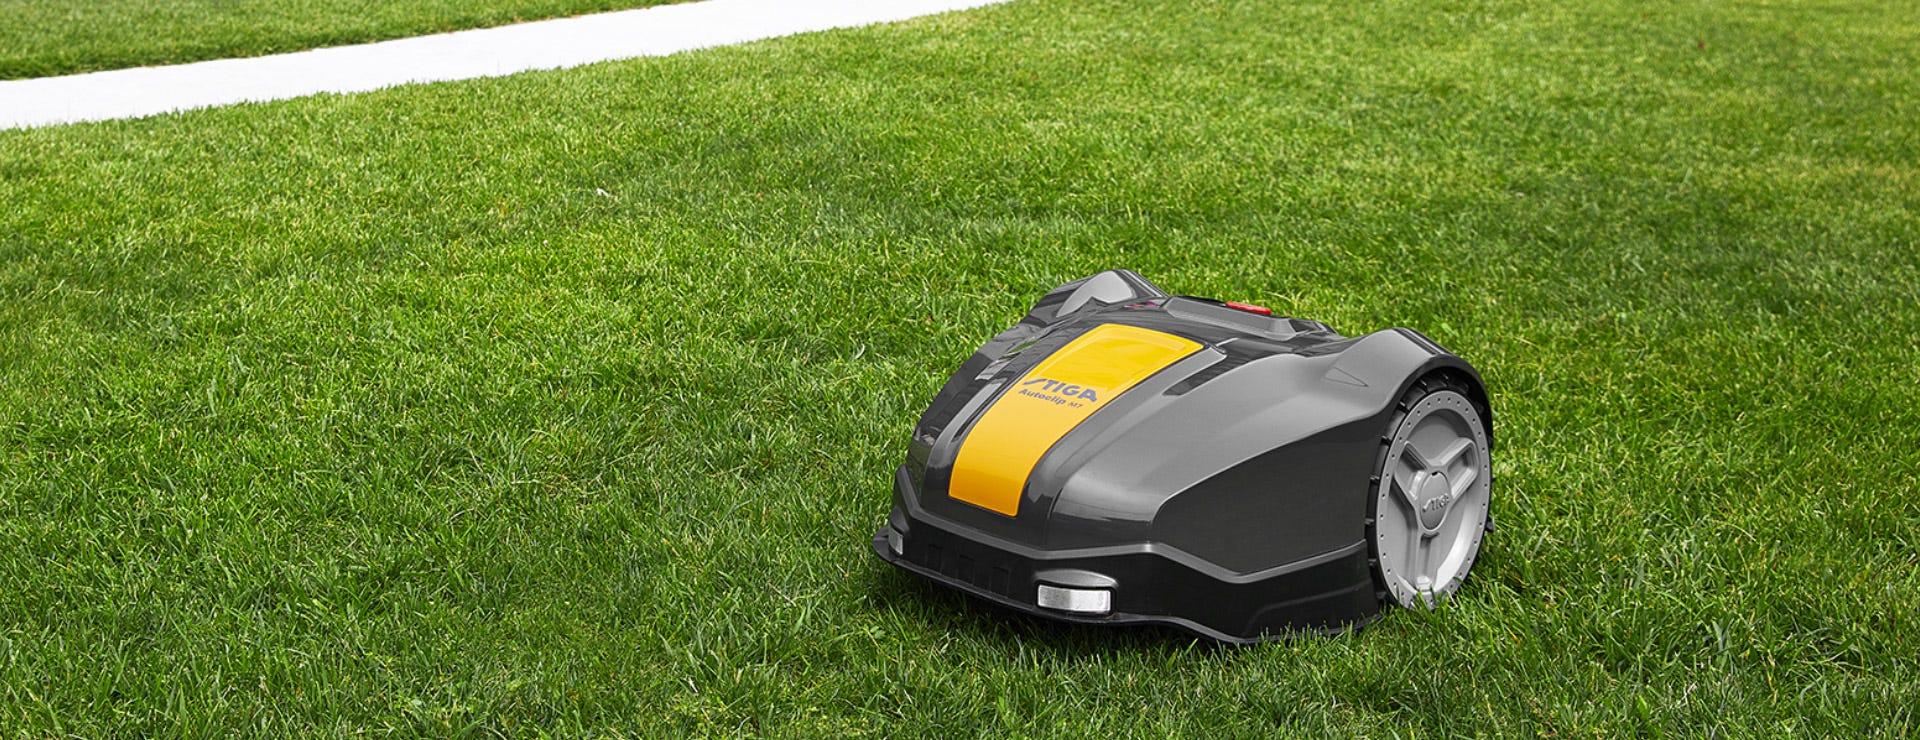 autoclip-m-series-robotmaaier